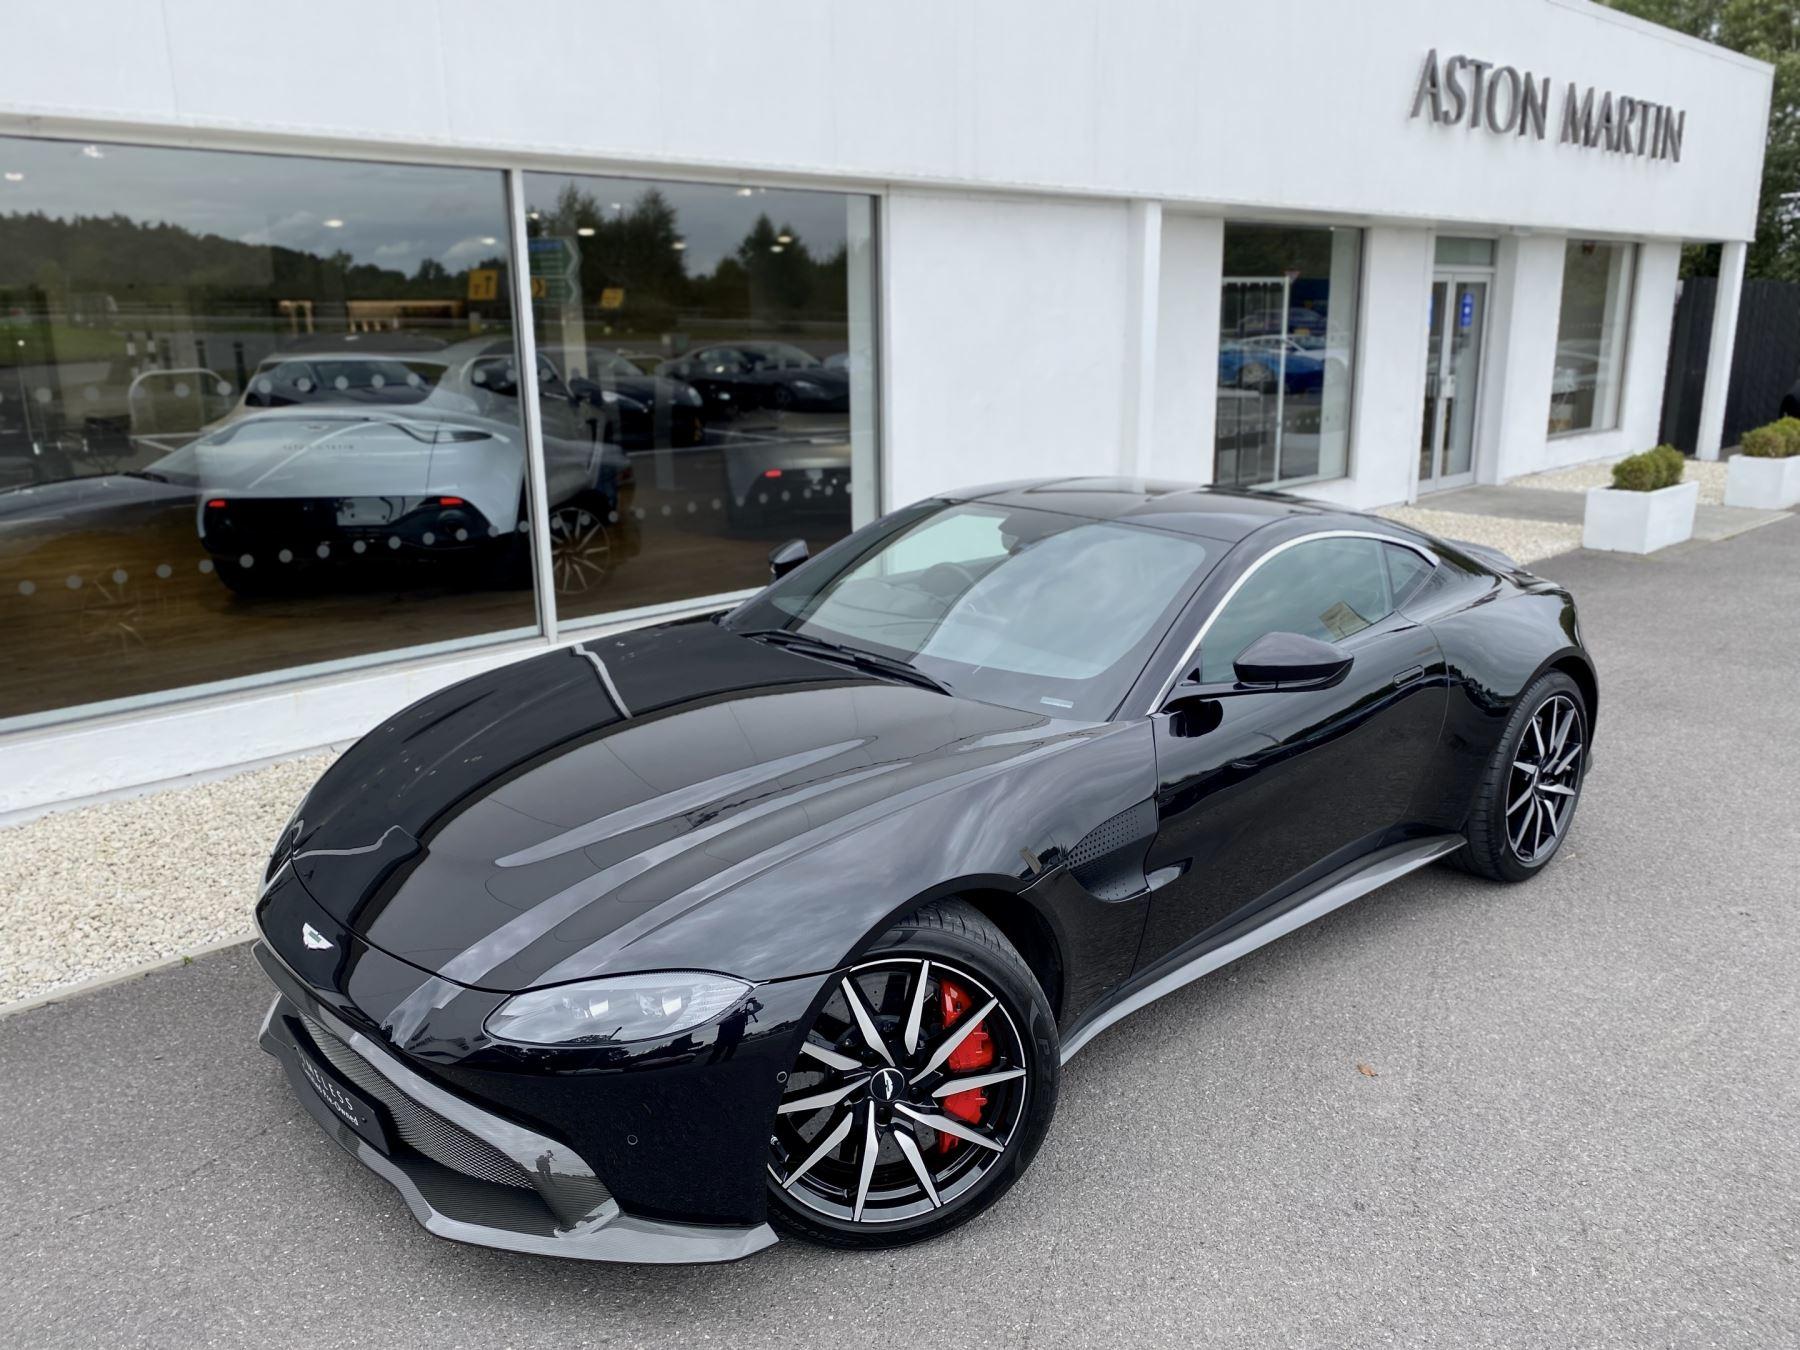 Aston Martin New Vantage 2dr ZF 8 Speed Auto. 4.0 Twin Turbo ZF Gearbox  Reversing Camera Heated Seats Ceramic Brakes image 10